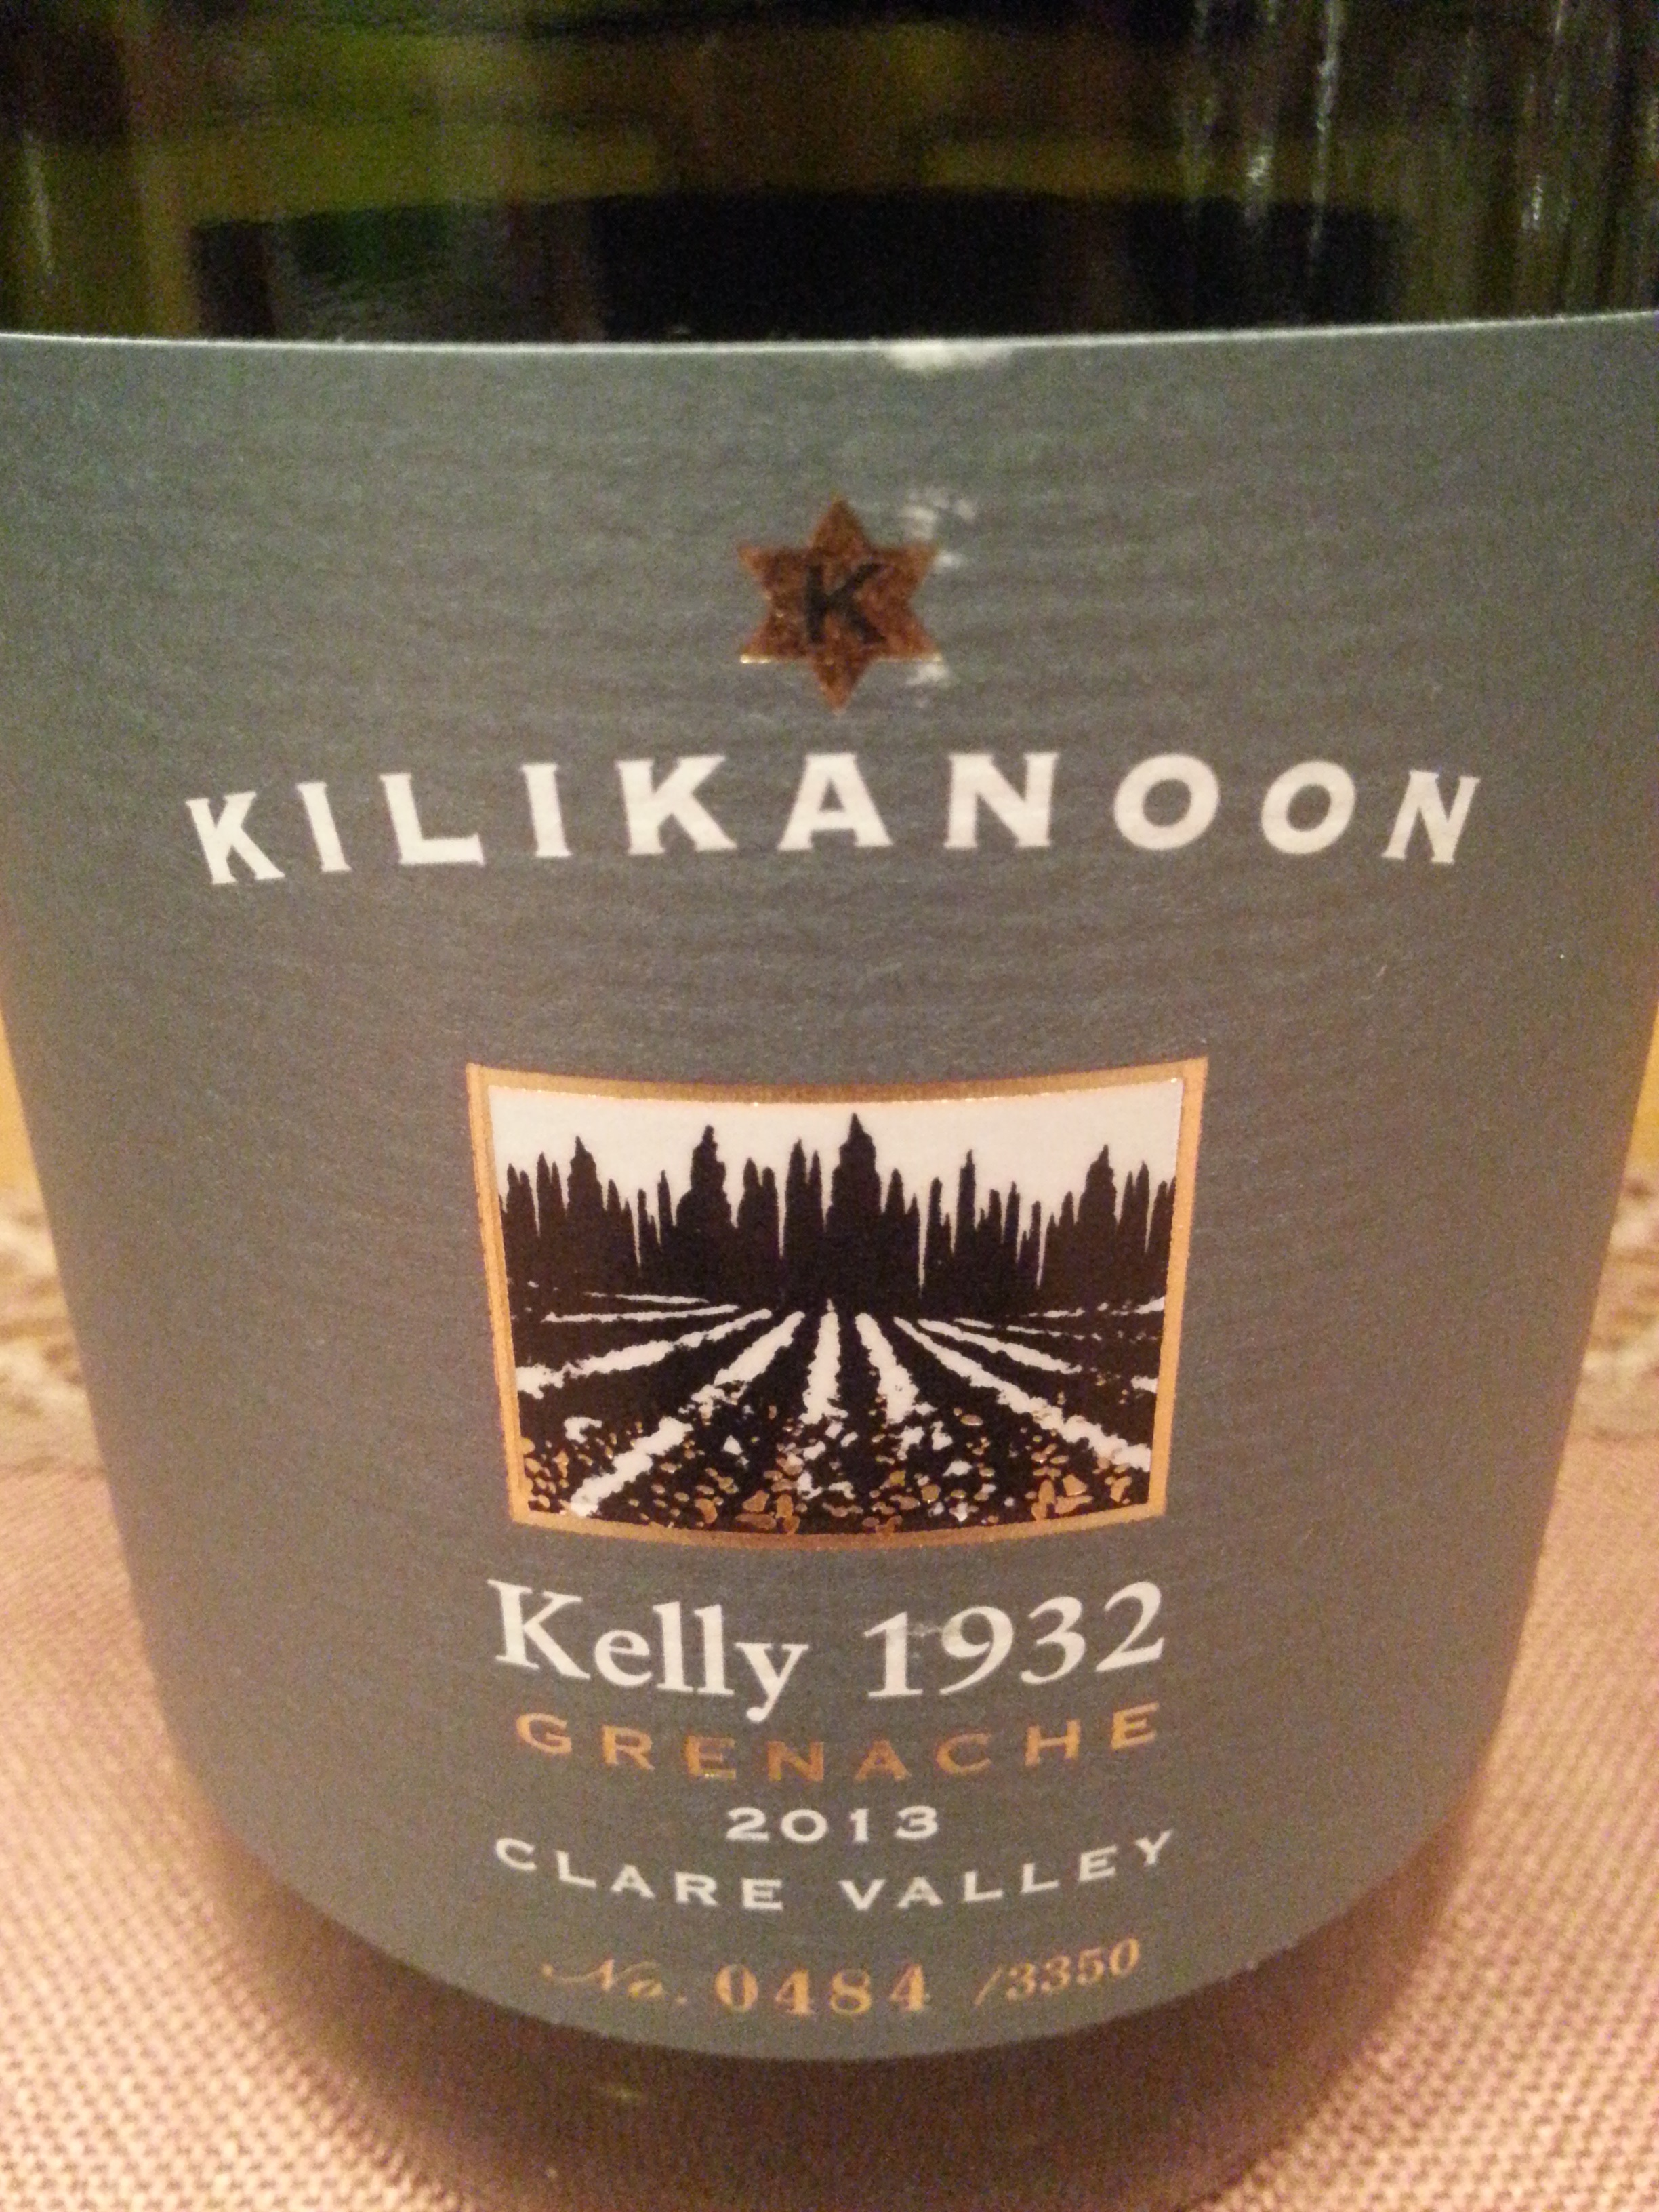 2013 Grenache Kelly 1932   Kilikanoon